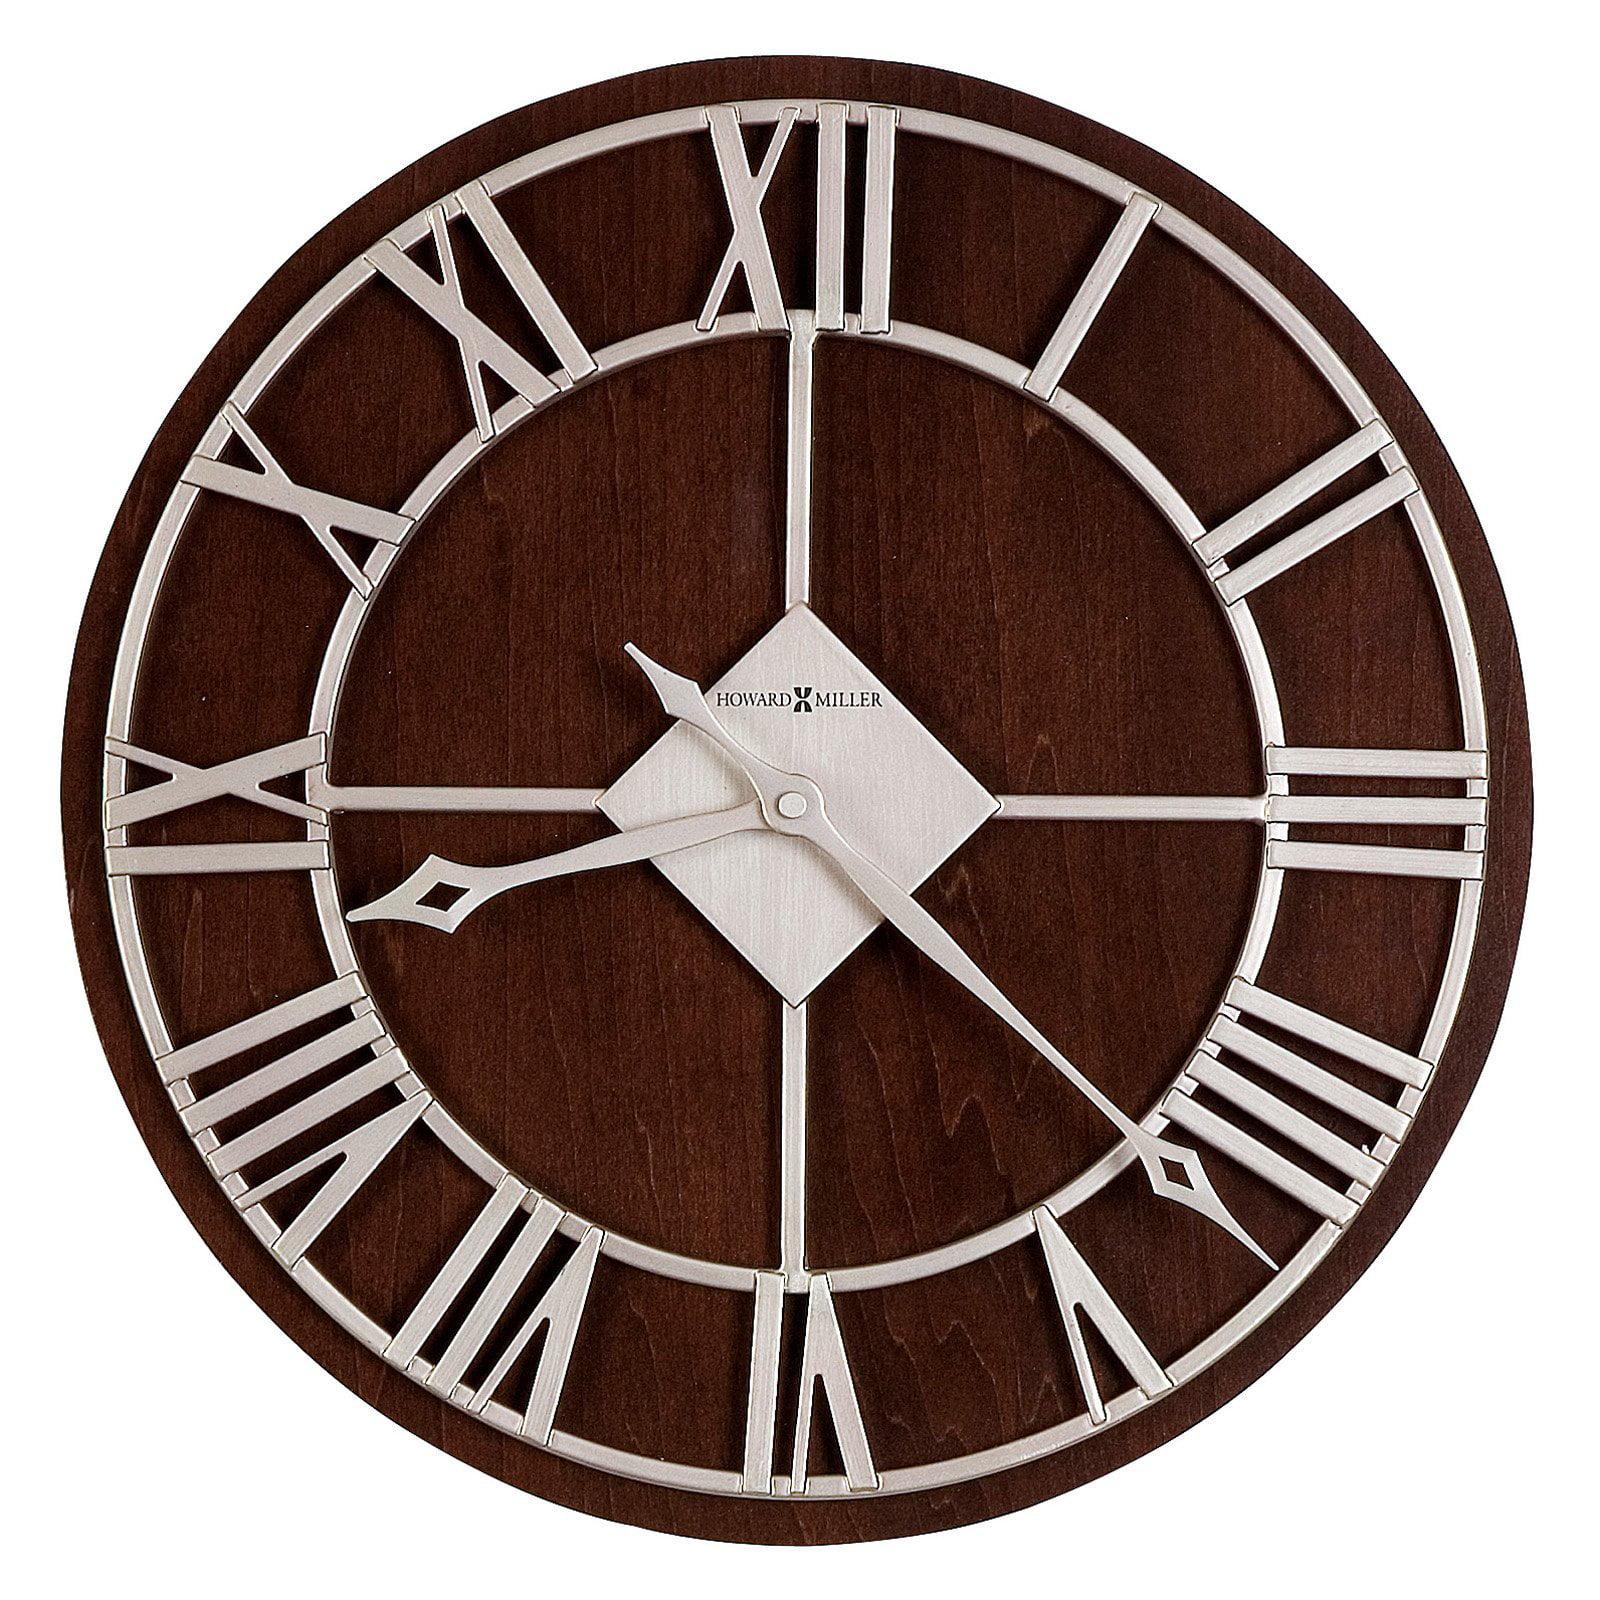 Howard Miller 625-496 Prichard 15 in. Wall Clock by Howard Miller